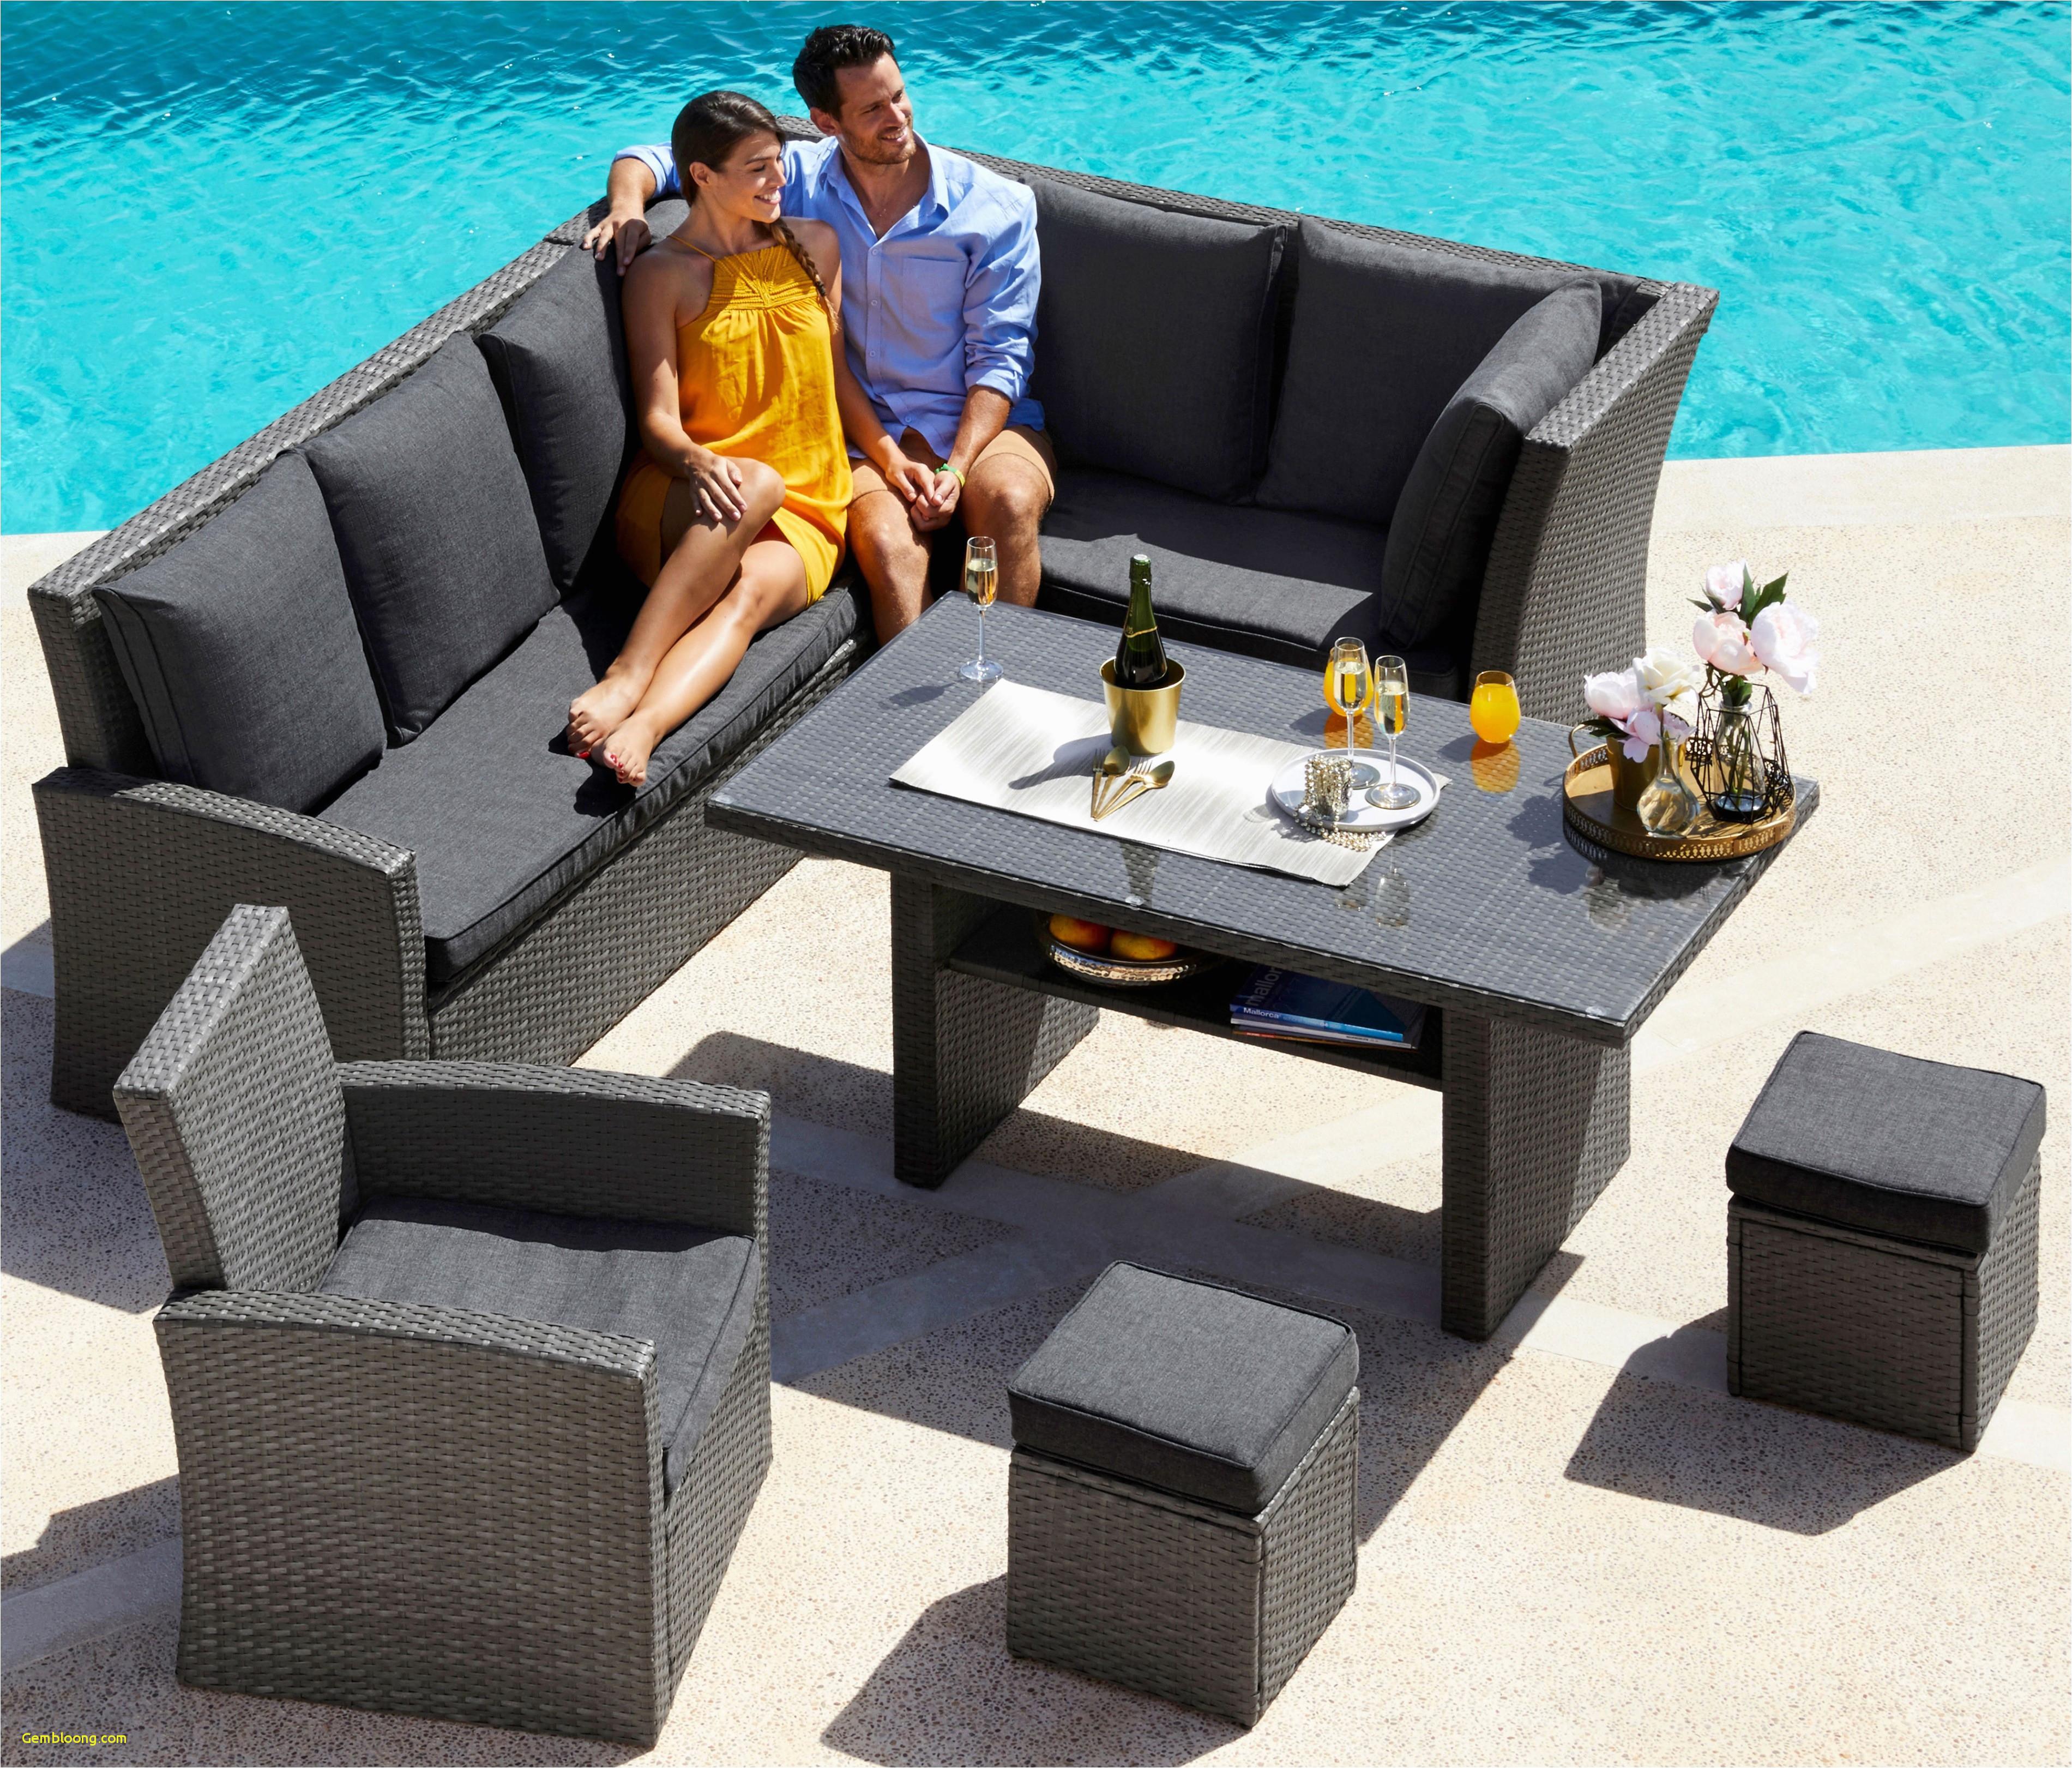 loungemobel outdoor ausverkauf outdoor living concepts ideas wicker outdoor sofa 0d patio chairs